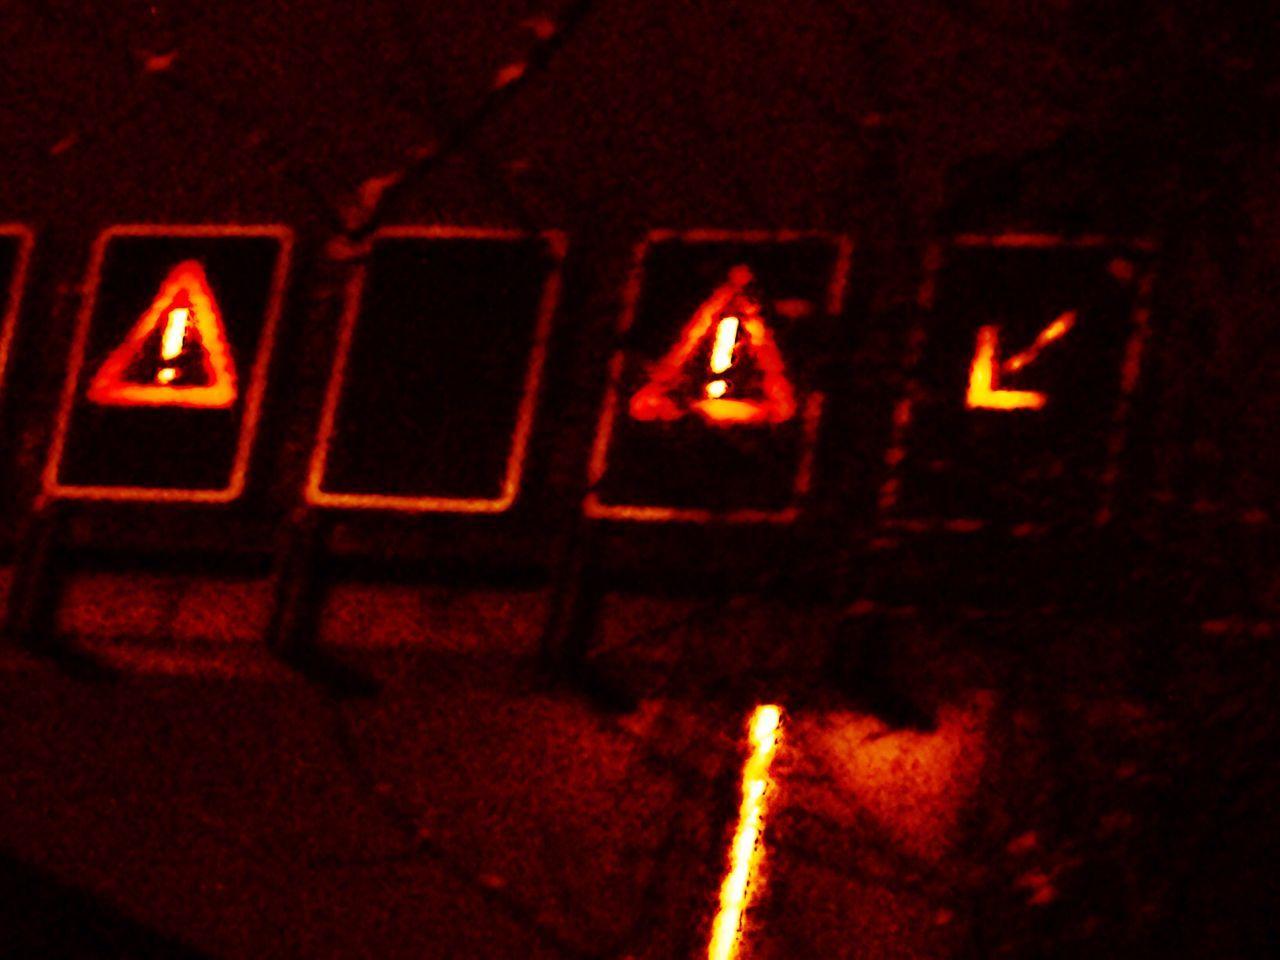 illuminated, night, glowing, no people, red, indoors, close-up, jack o lantern